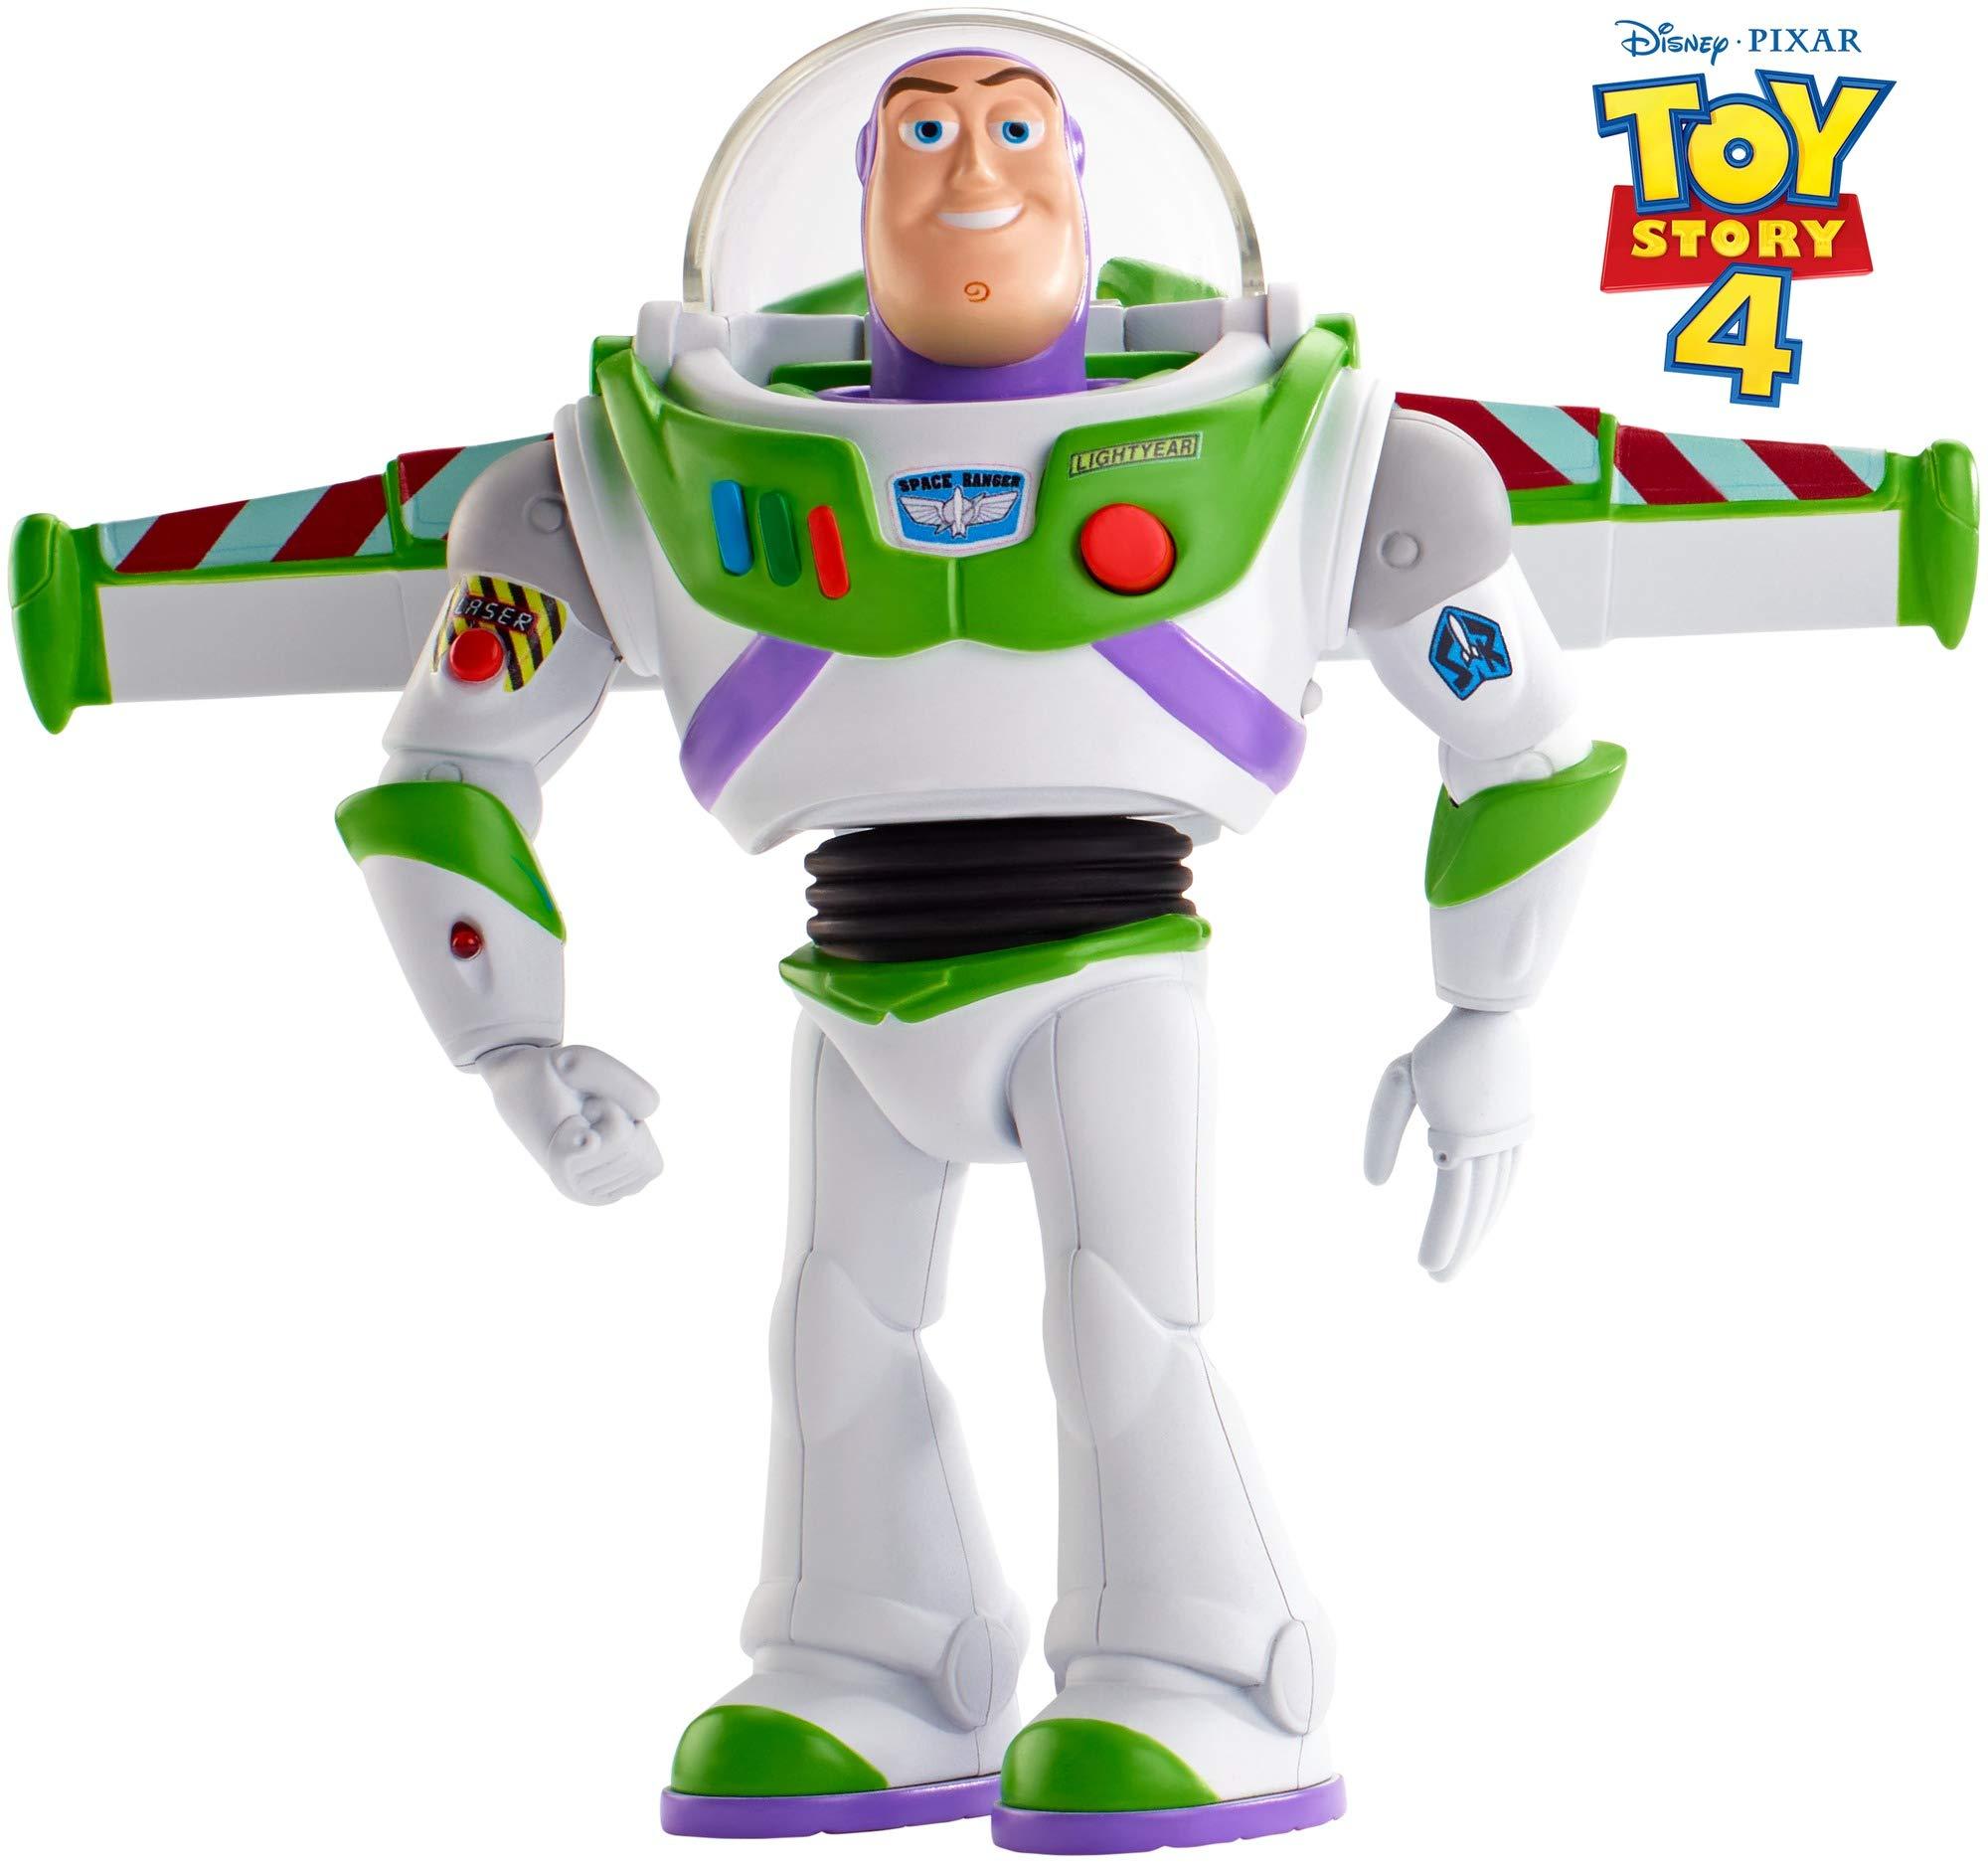 Disney Pixar Toy Story Ultimate Walking Buzz Lightyear, 7'' by Toy Story